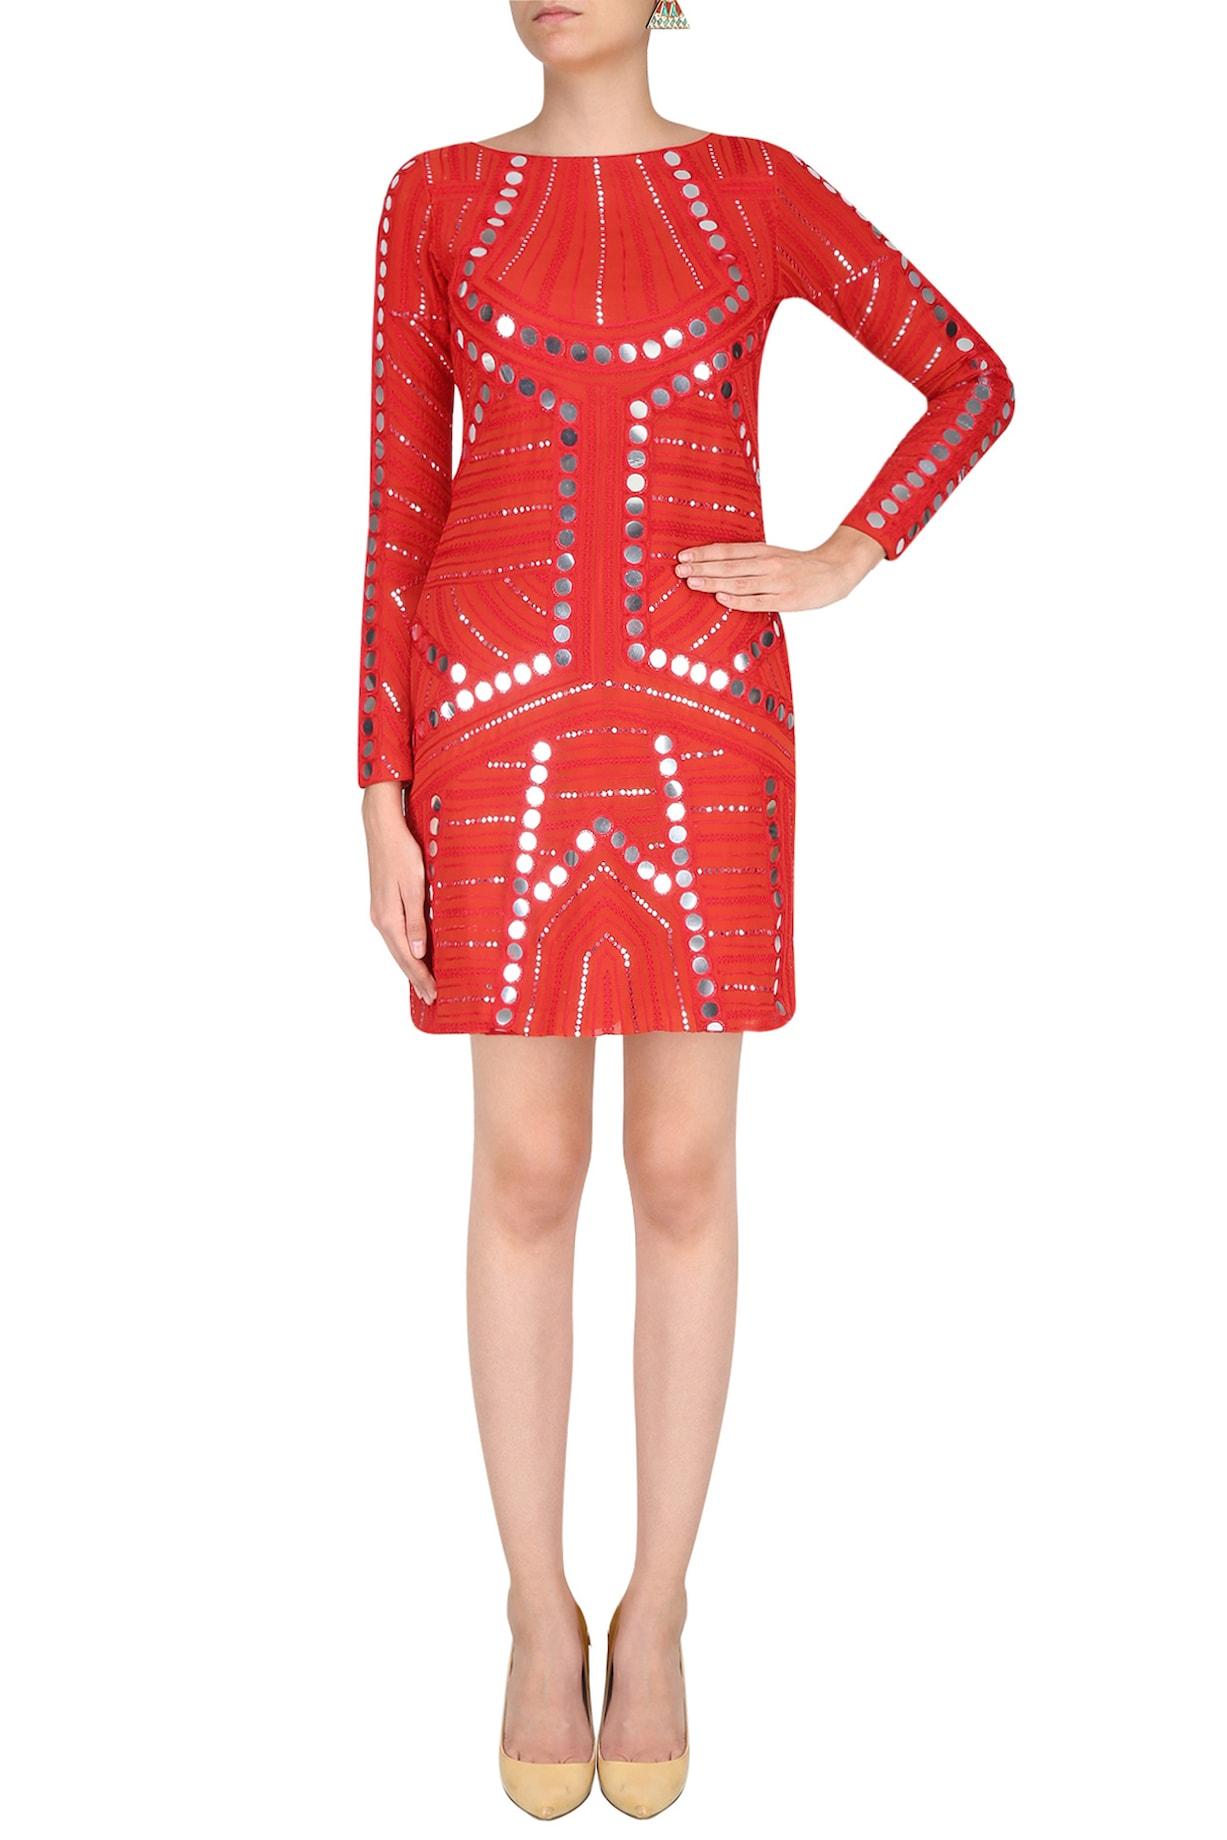 Preeti Reddy Dresses